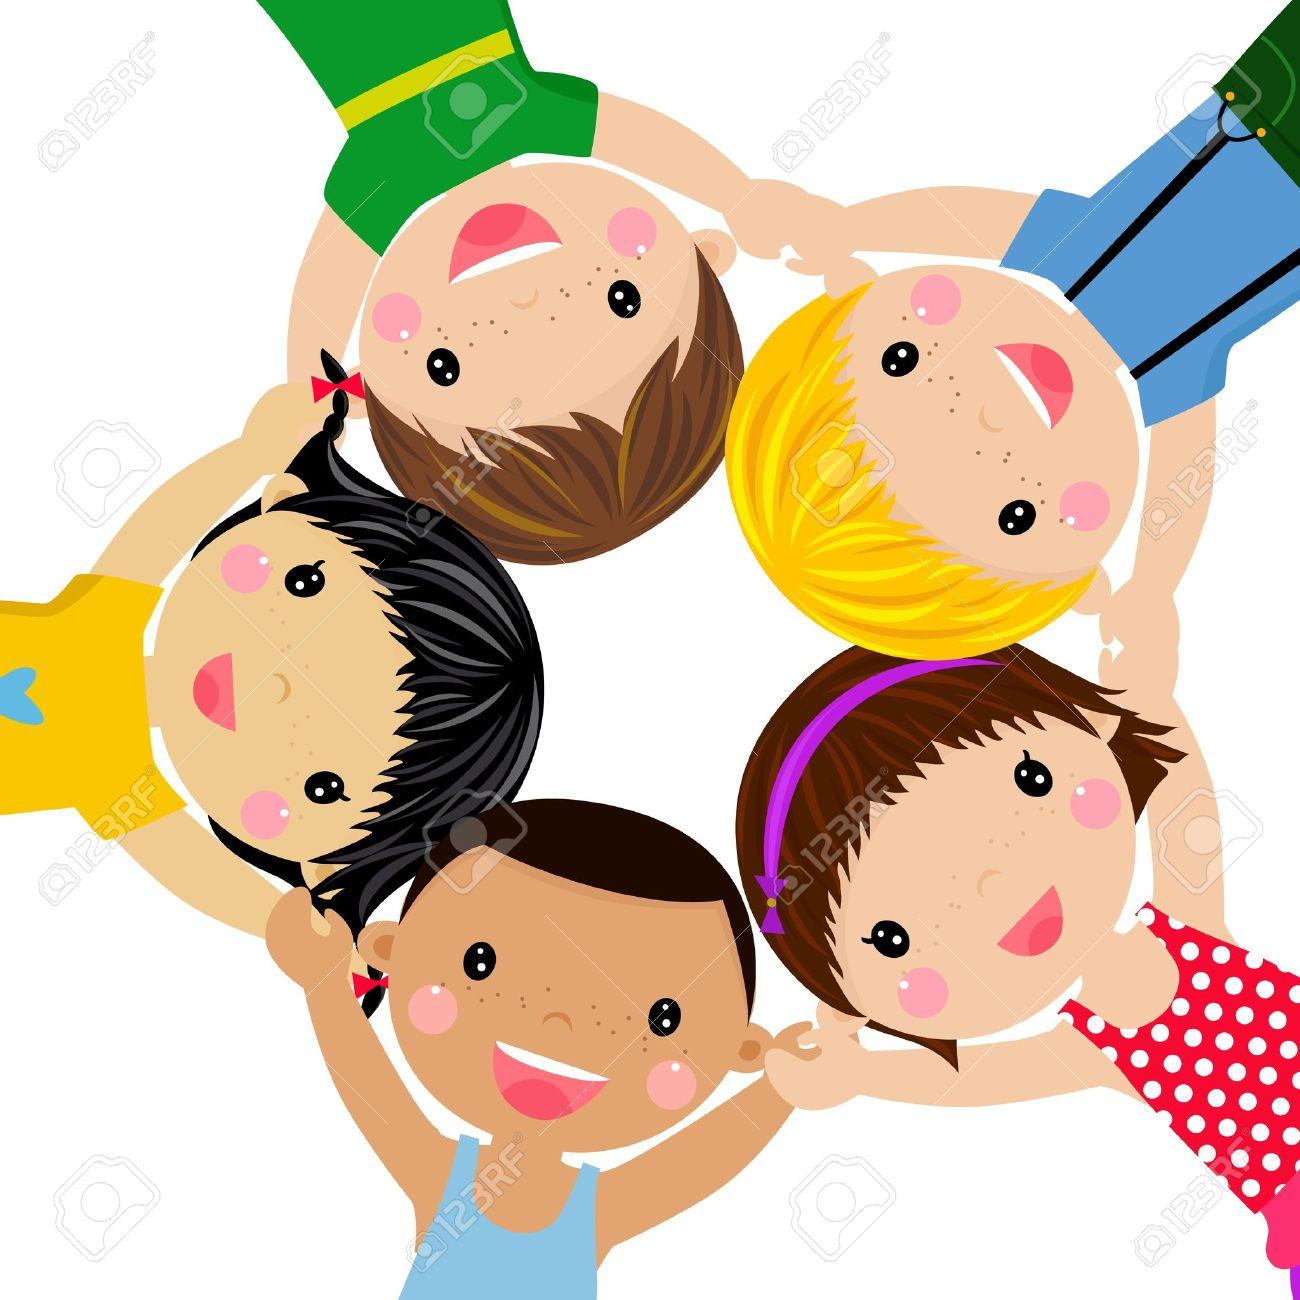 happy children hand in hand around illustration stock vector 14849935 - Kids Cartoon Picture